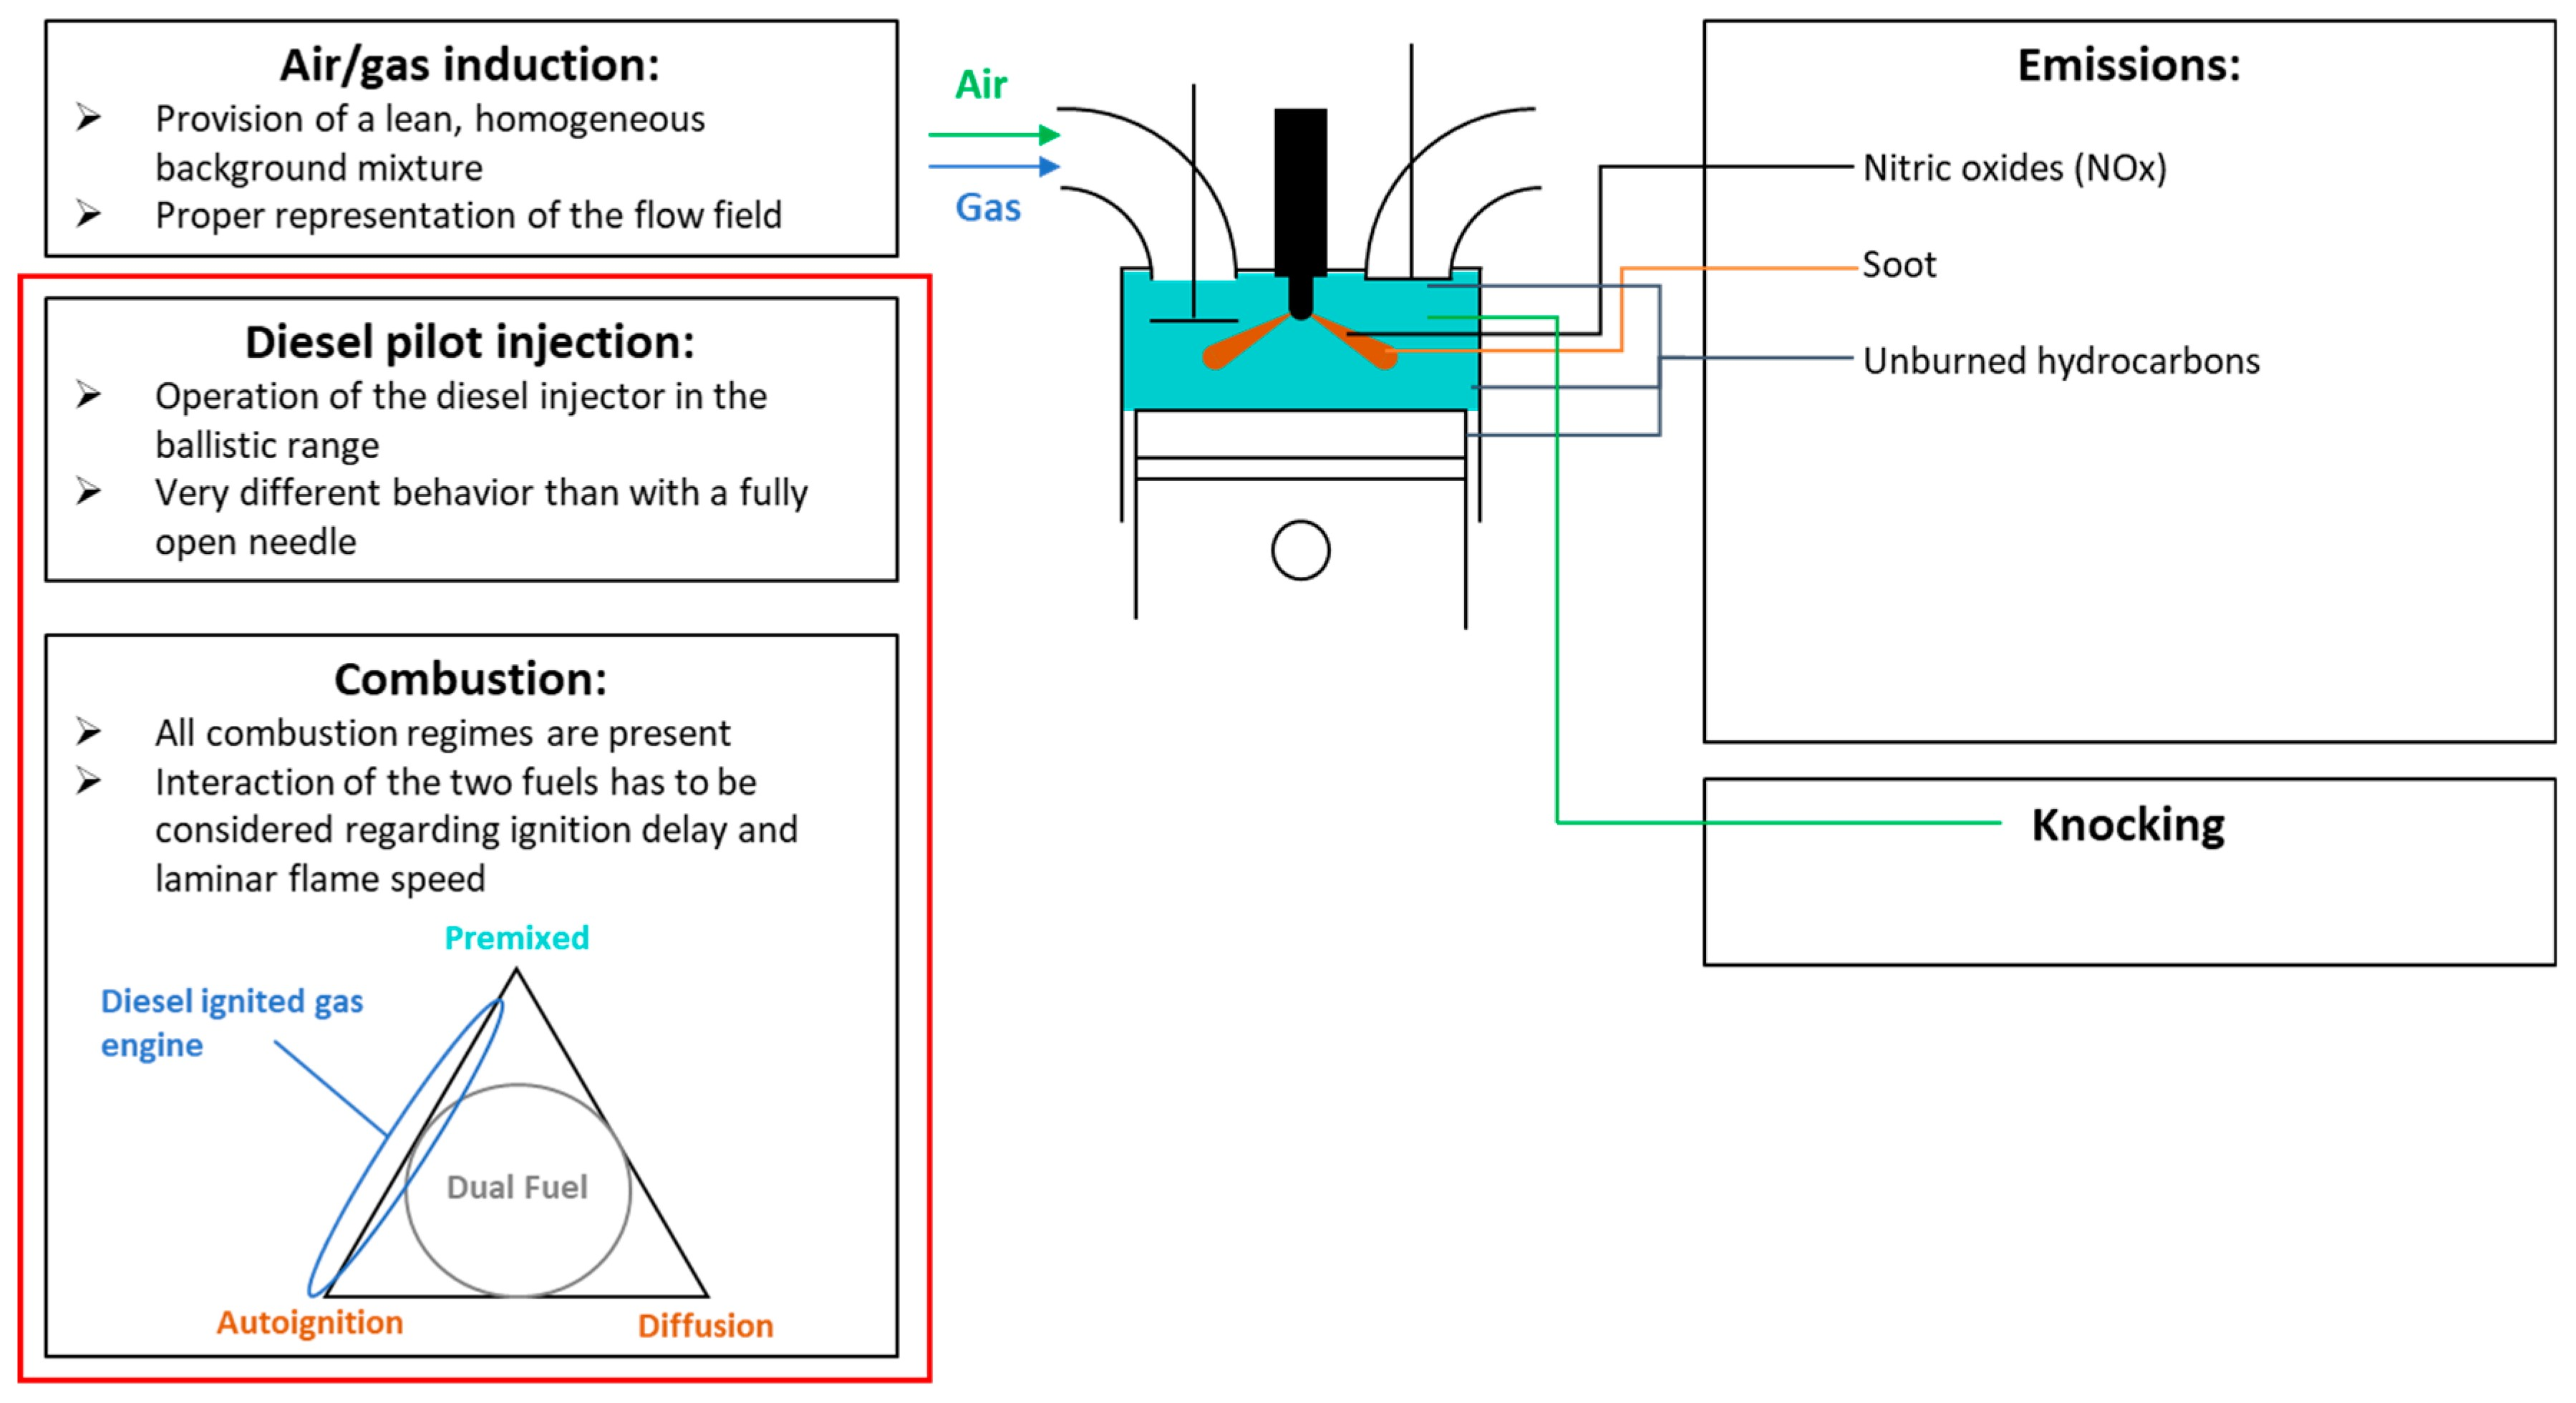 2 Stroke Marine Diesel Engine Timing Diagram Energies Free Full Text Of 2 Stroke Marine Diesel Engine Timing Diagram